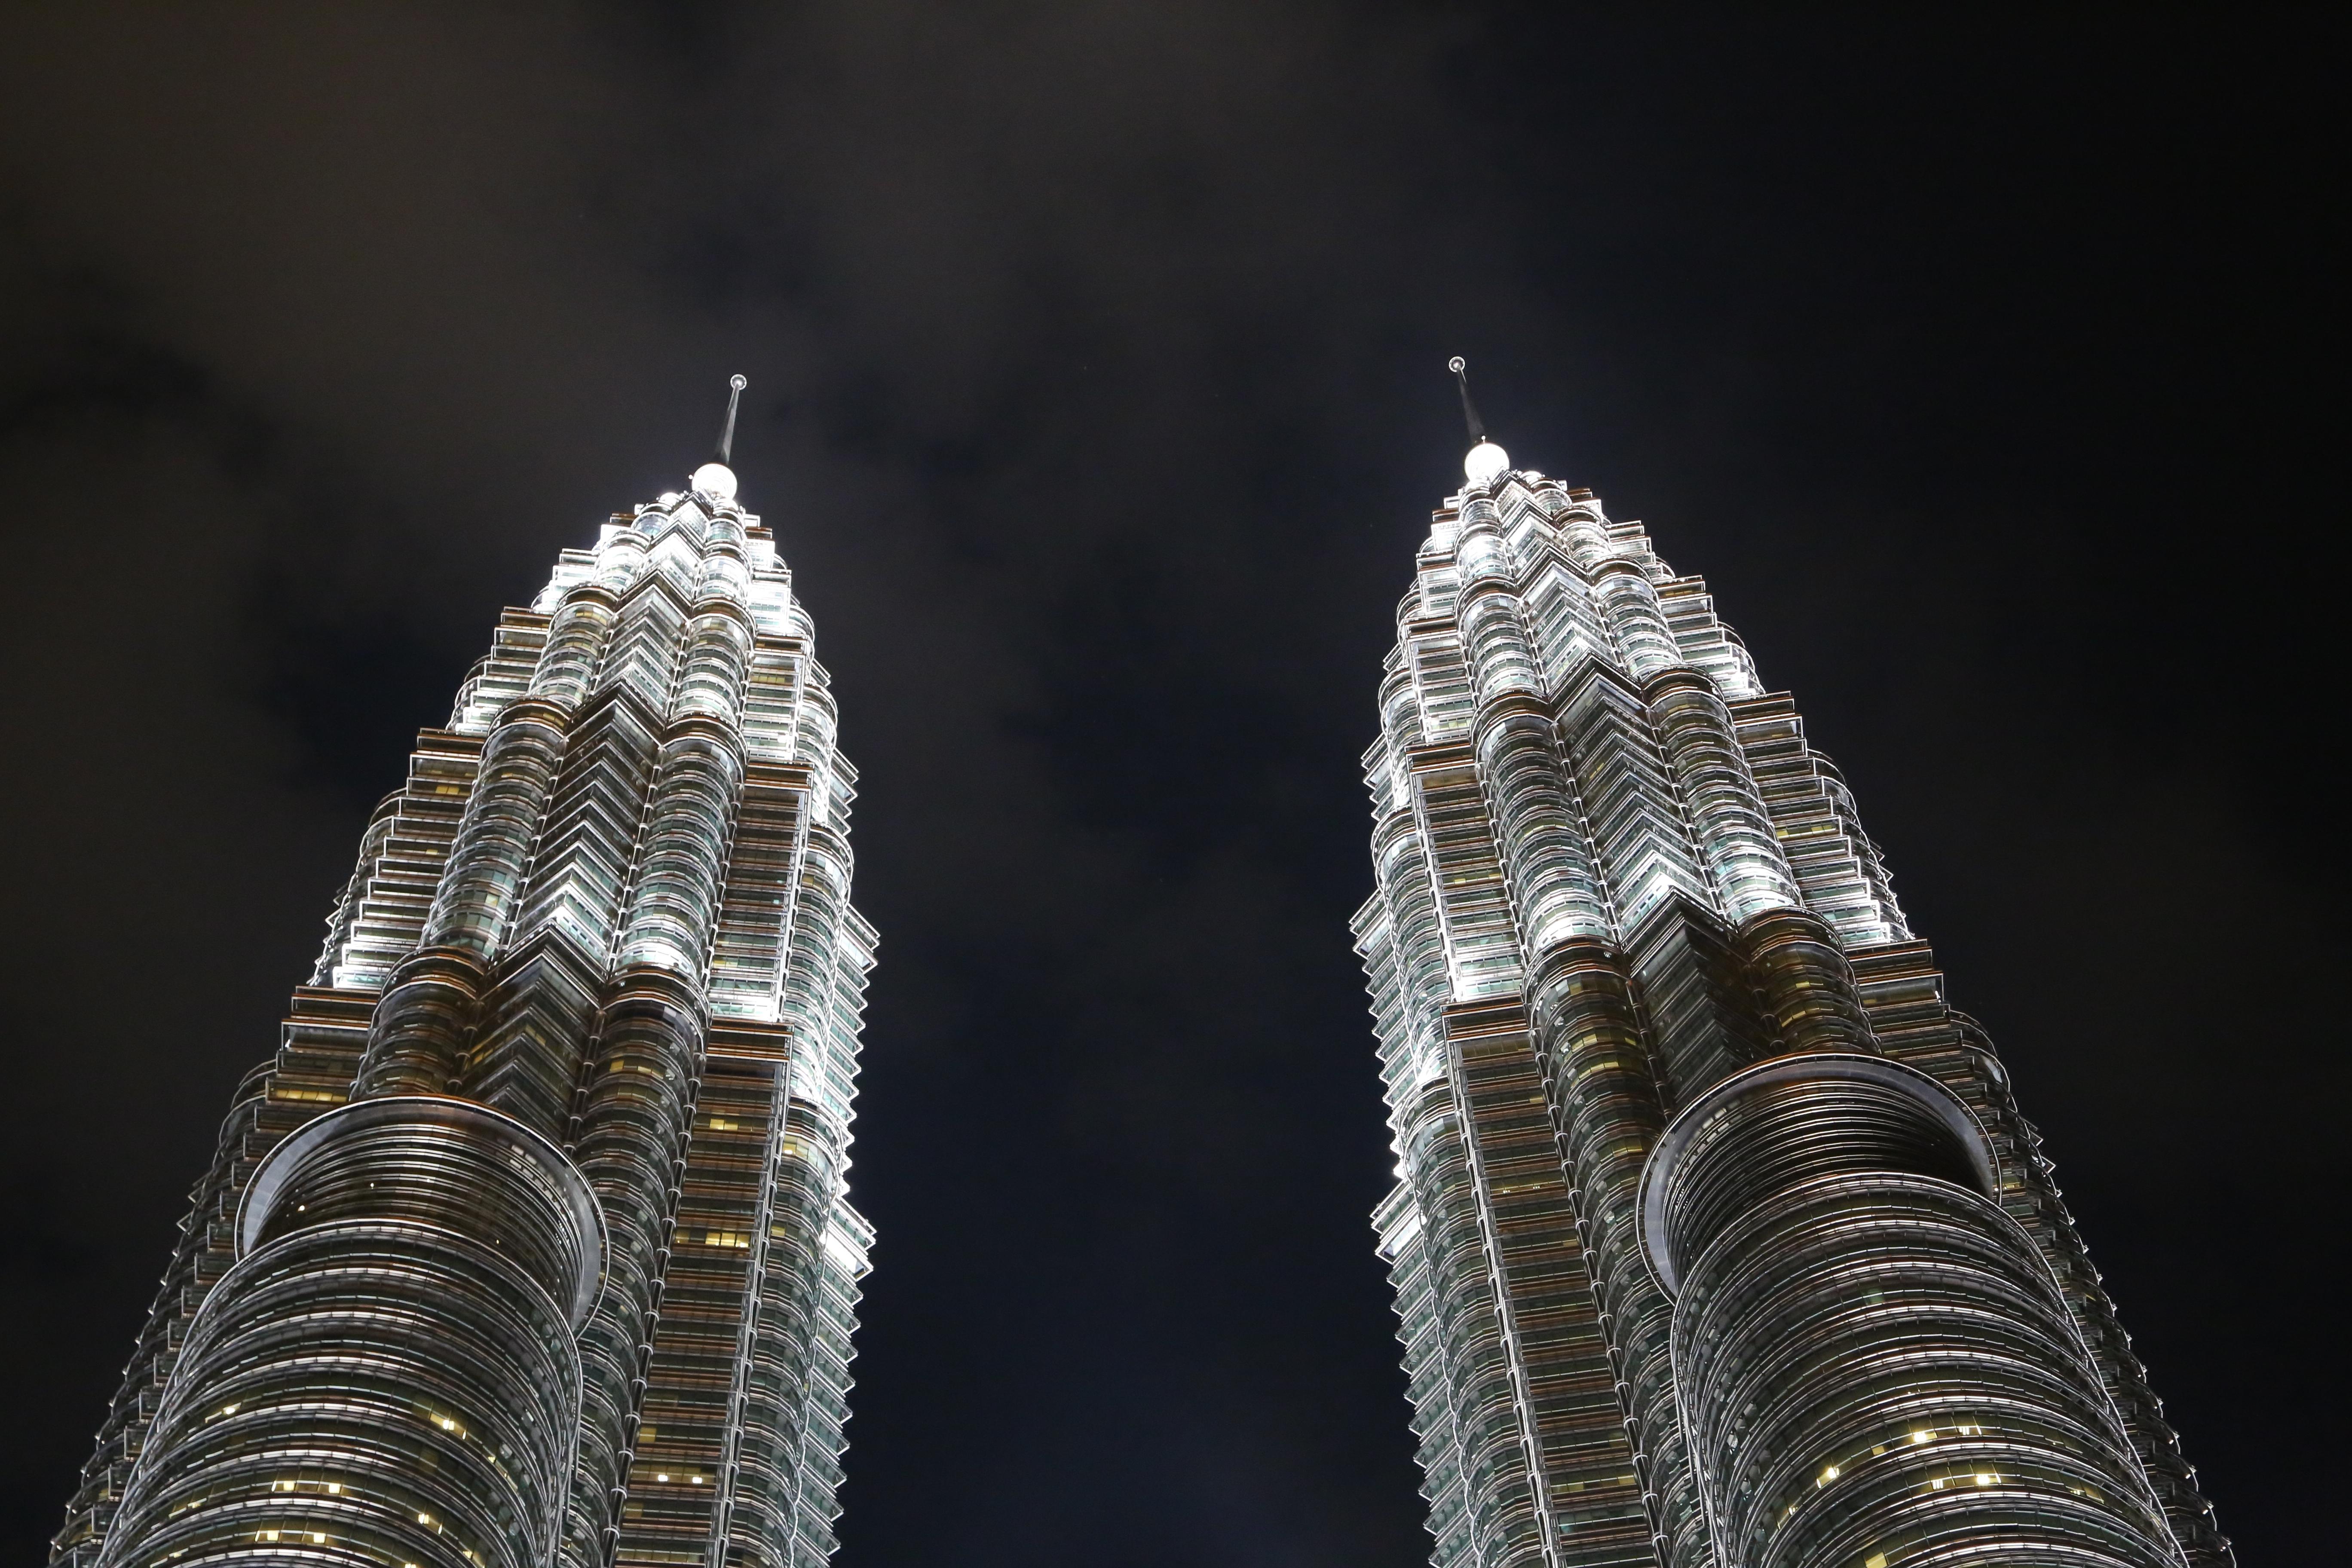 Petronas Towers Detail, Kuala Lumpur, Malaysia